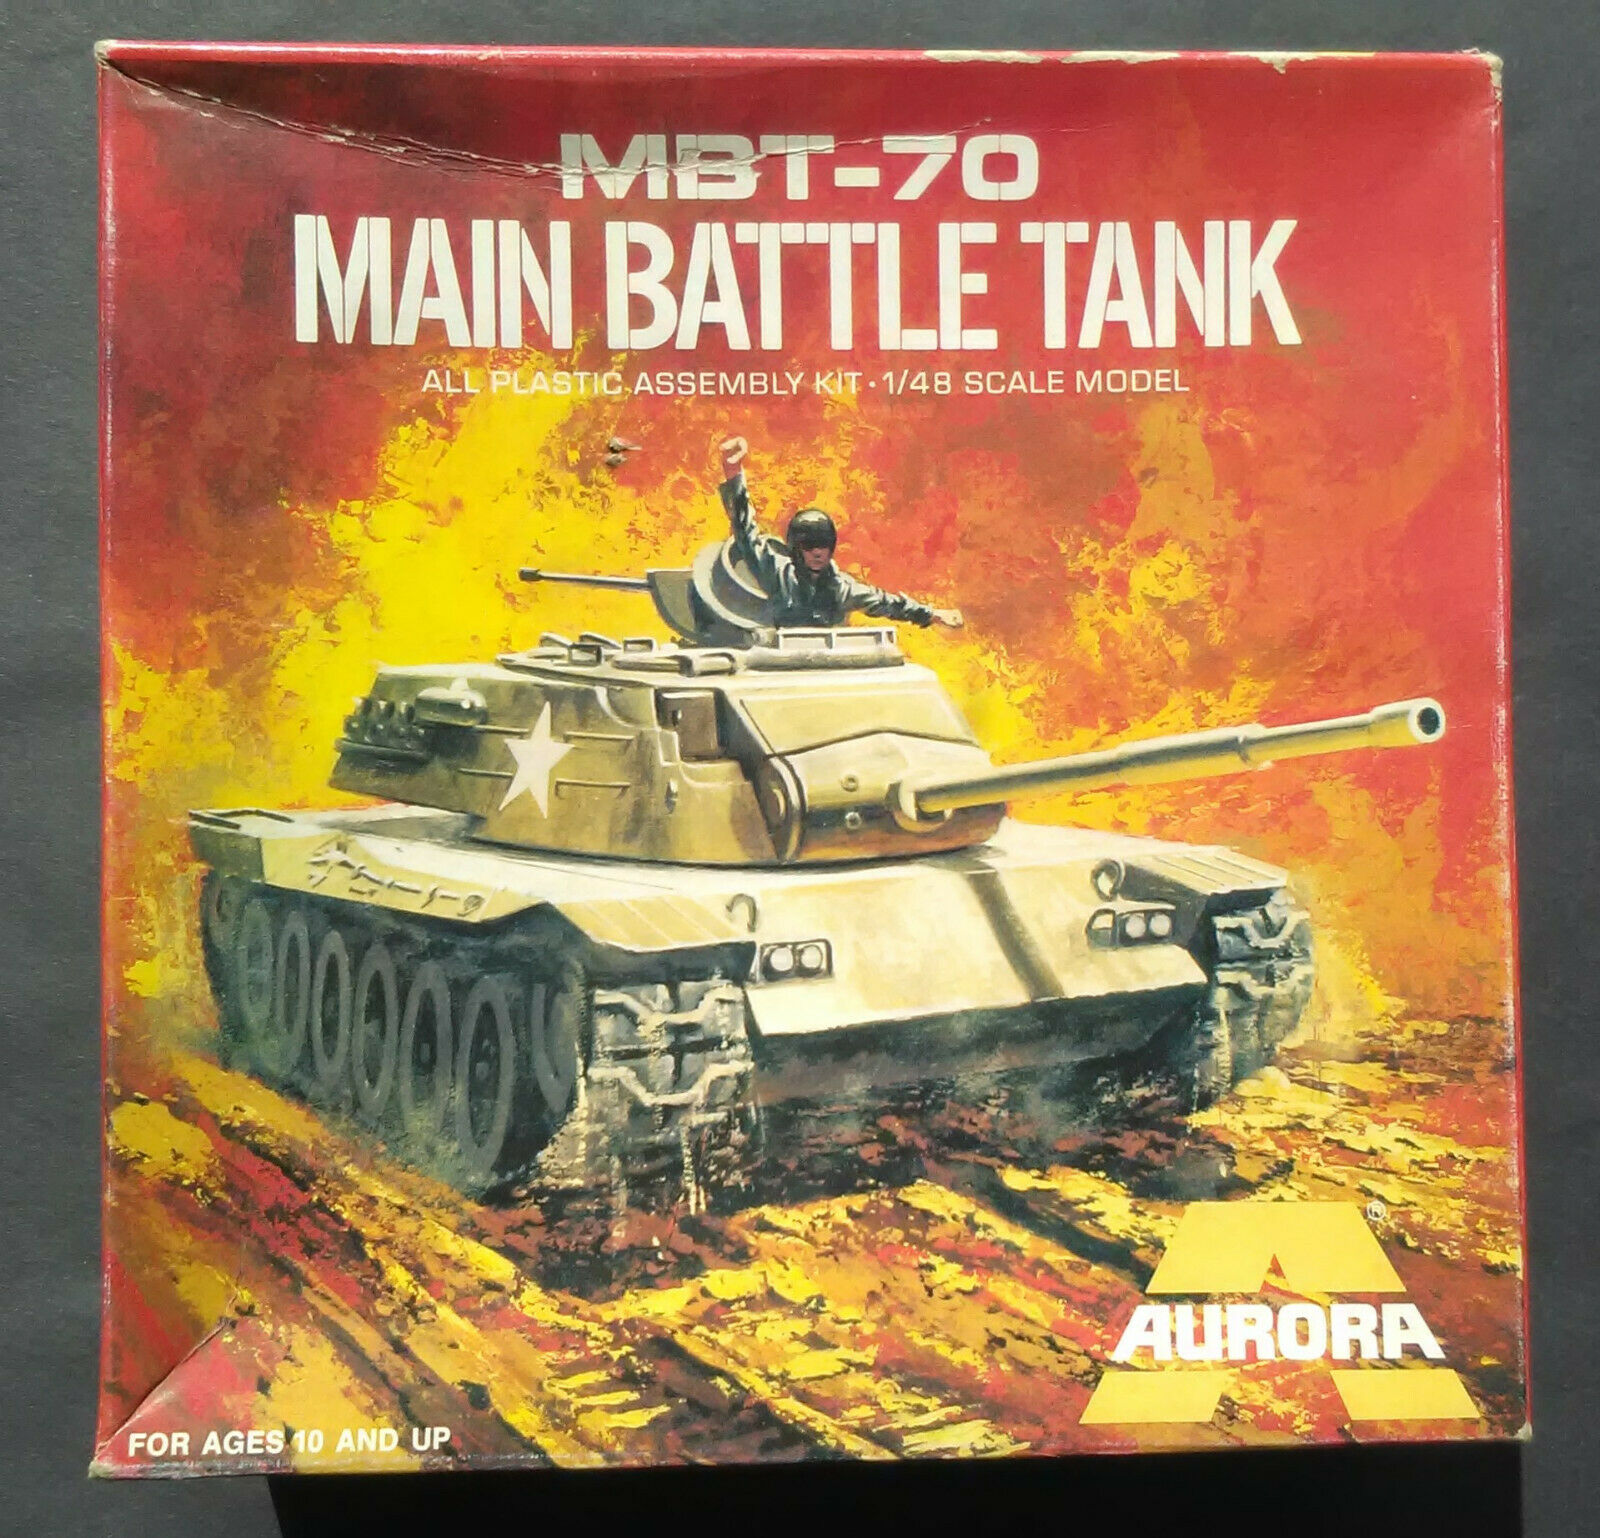 Vintage (1972) 1 48 (1 4 scale) Aurora U.S. U.S. U.S. MBT-70 Main Battle Tank model kit 9f7